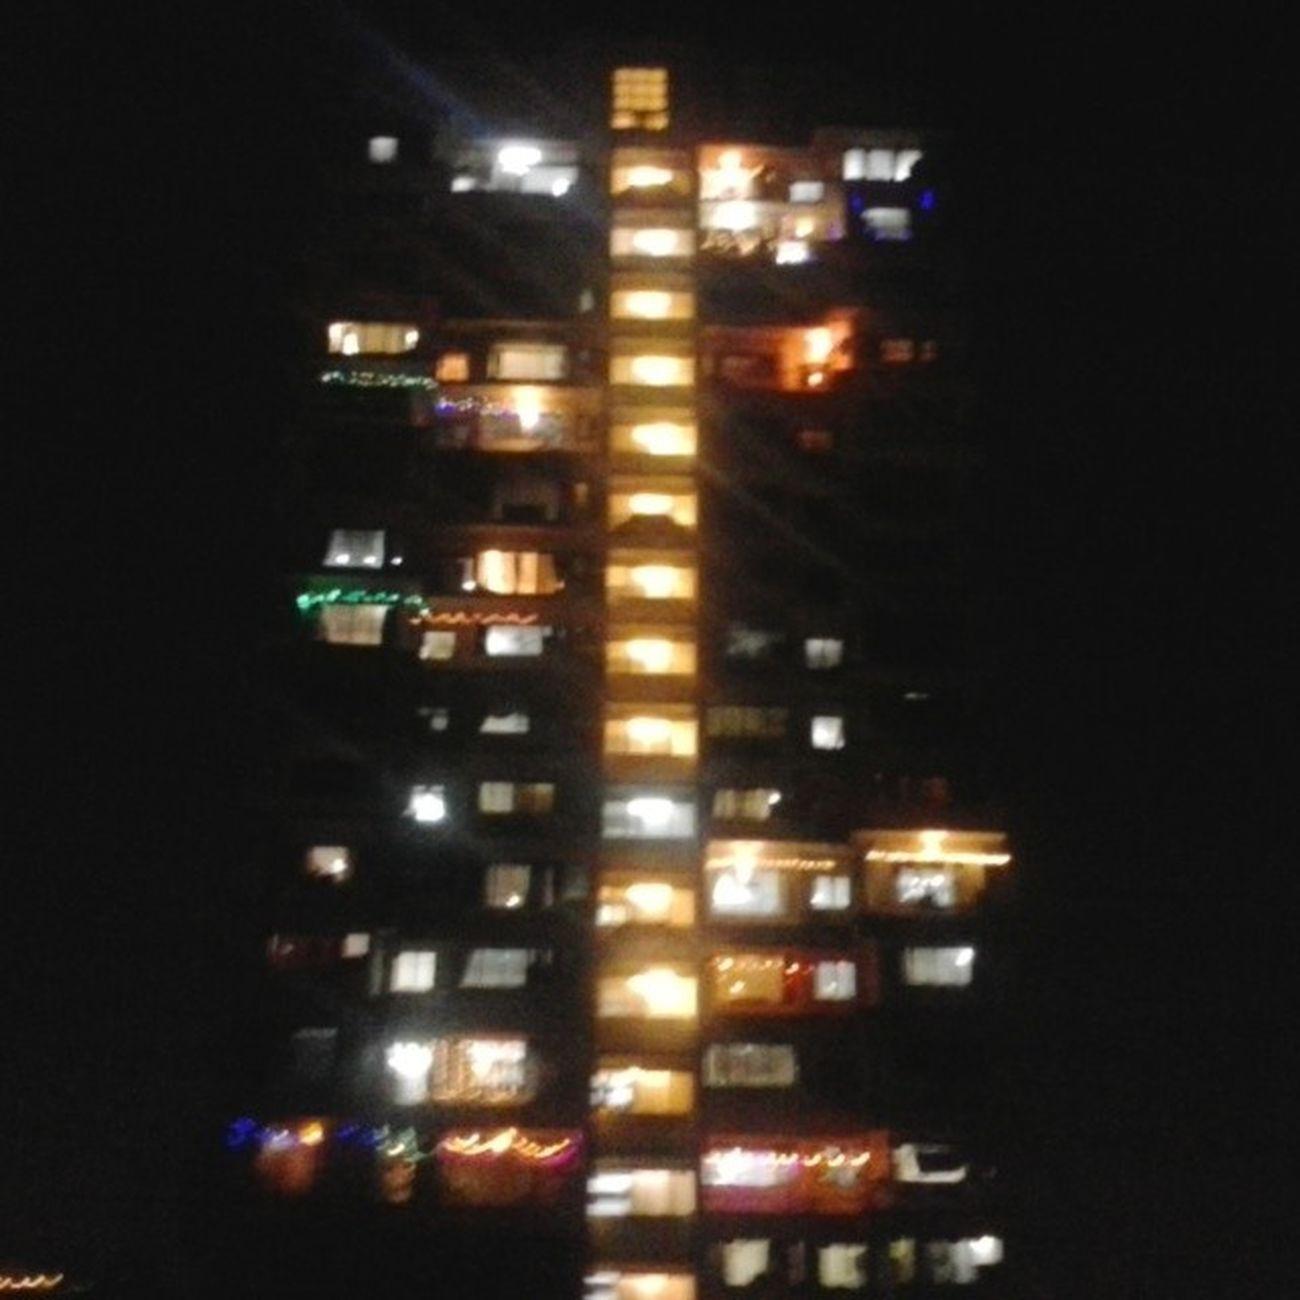 Whpstraightfacades Diwali India Festivaloflights Alllitup Lanterns Colourful Windows Lights Family Celebration Colouredlights Decorative Fests People Indian Safediwali Auspicious Lessnoise Lesspollution Lesscrackers Wearegettingthere :)